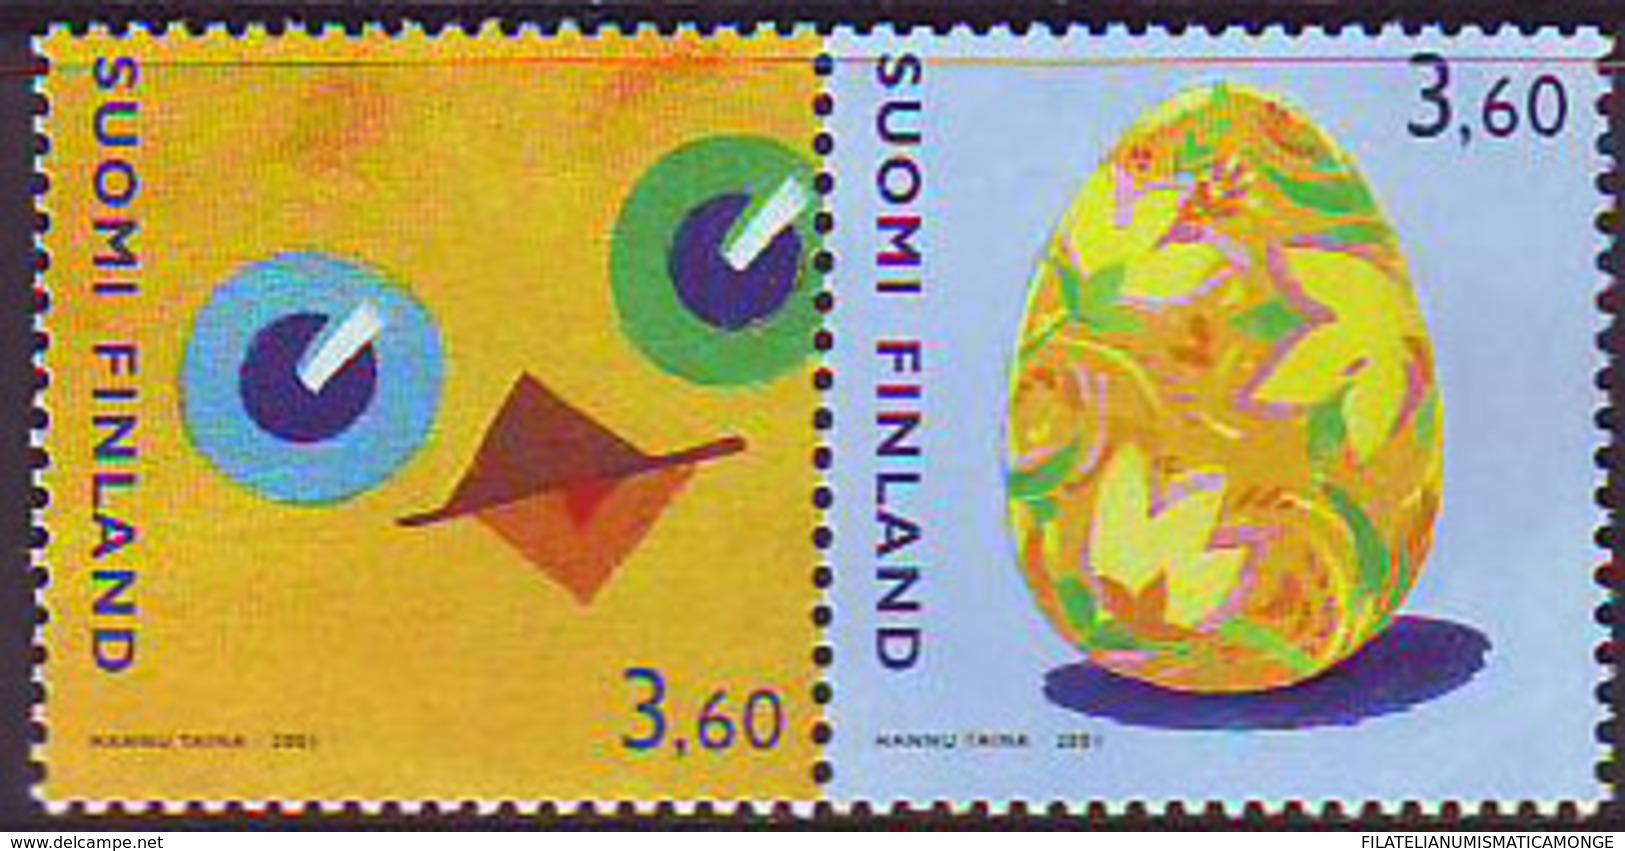 Finlandia 2001  Yvert Tellier  1526/27 Pascua  ** - Unused Stamps